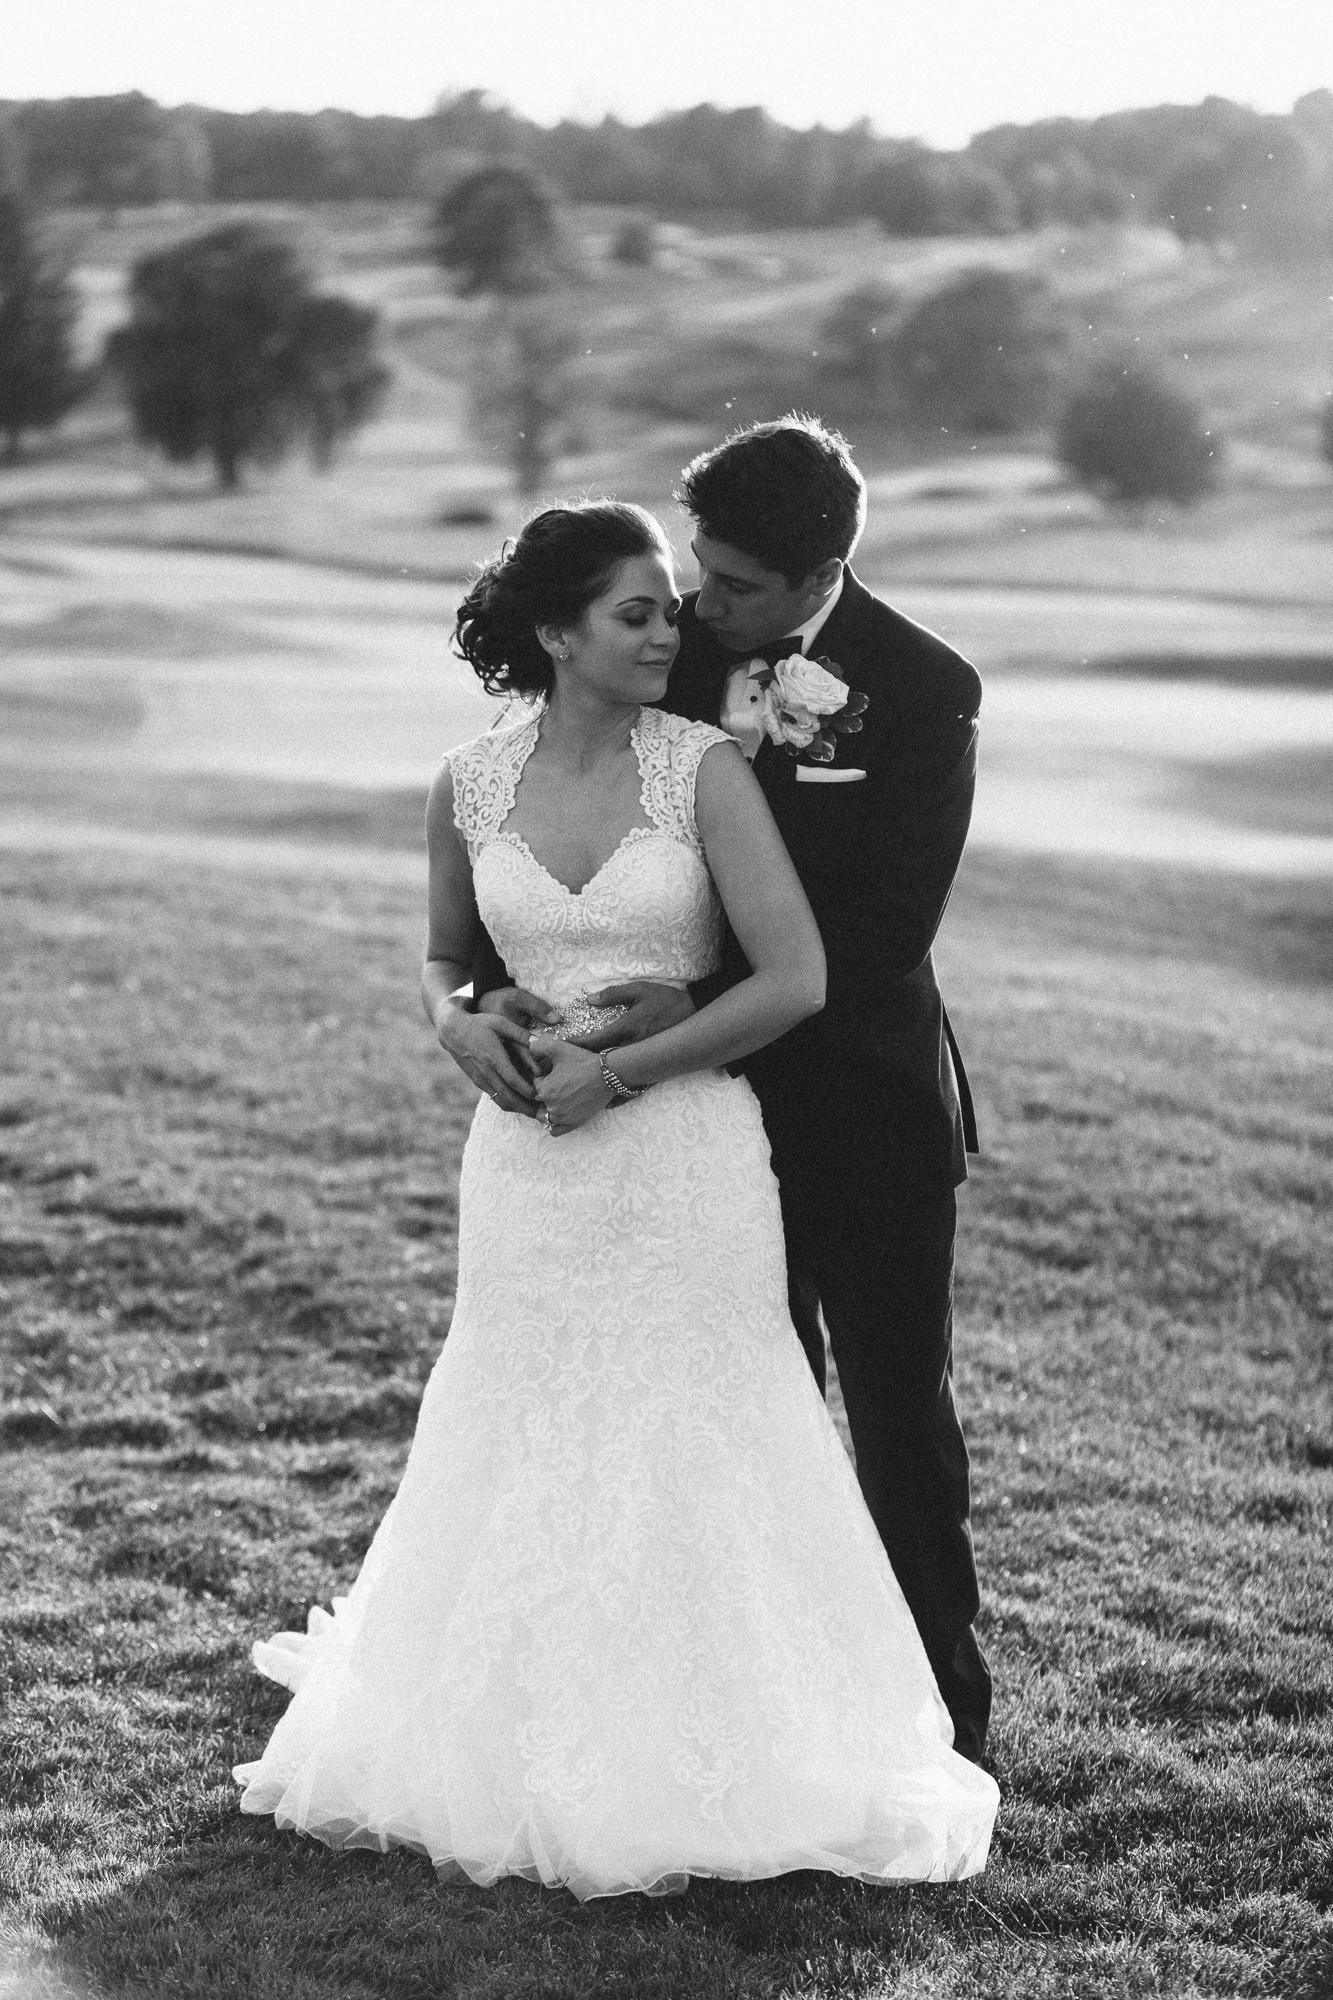 scranton-wedding-photography-zak-zavada-2016.06-rebeccaIan-1876.jpg